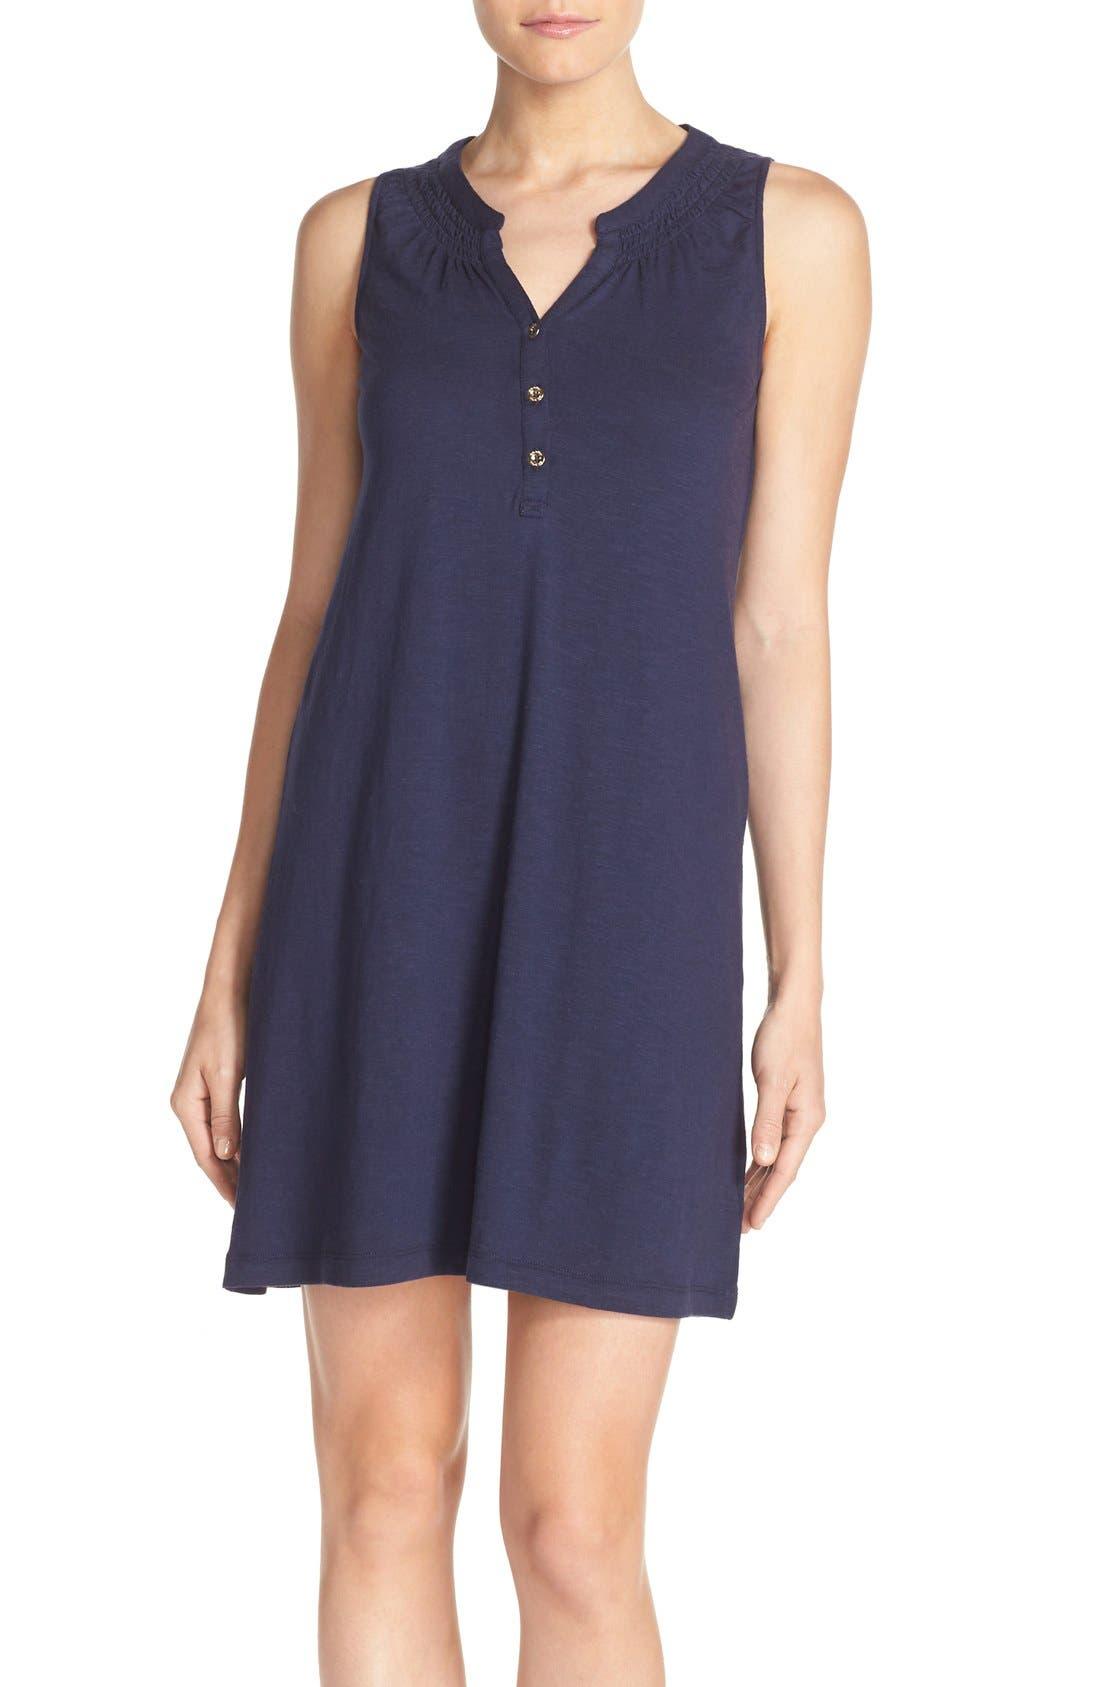 Lilly Pulitzer® 'Essie' Cotton & Modal A-Line Dress